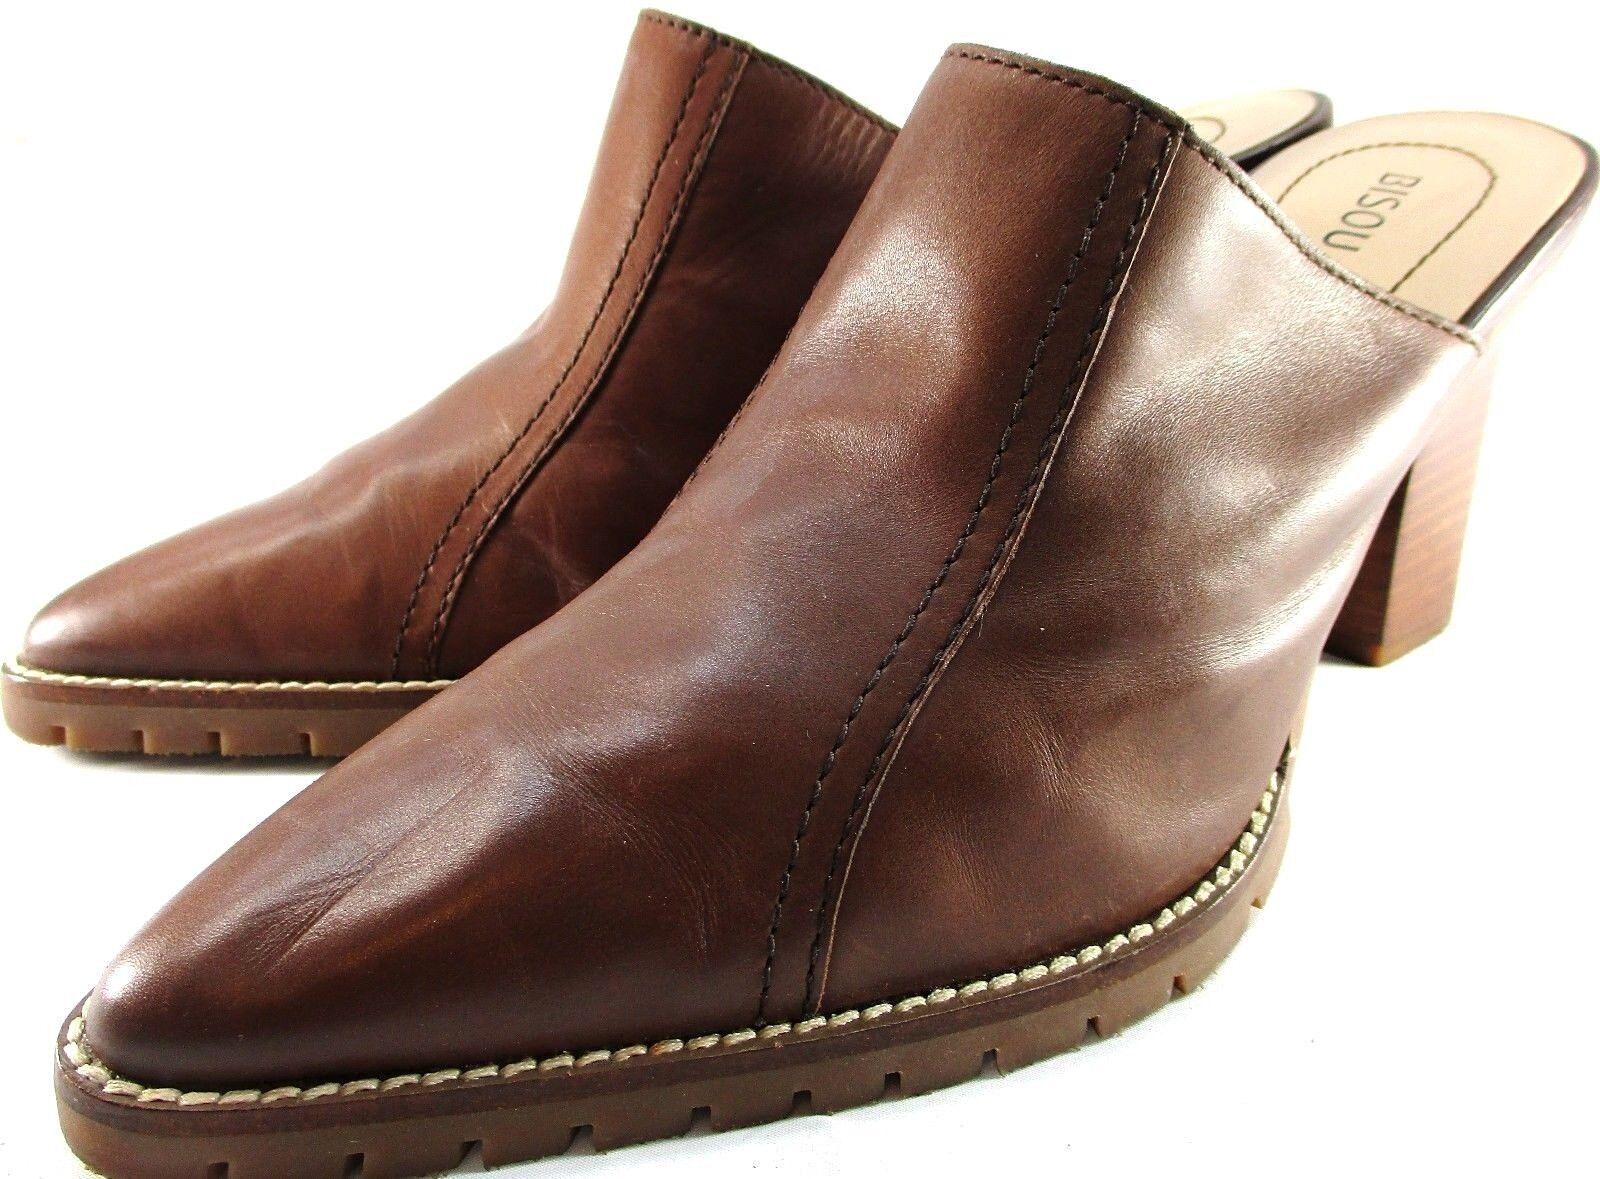 Bisou Bisou Women Heels 9 M Brown Leather Style C17 Heels 3.5 Slip Resistant